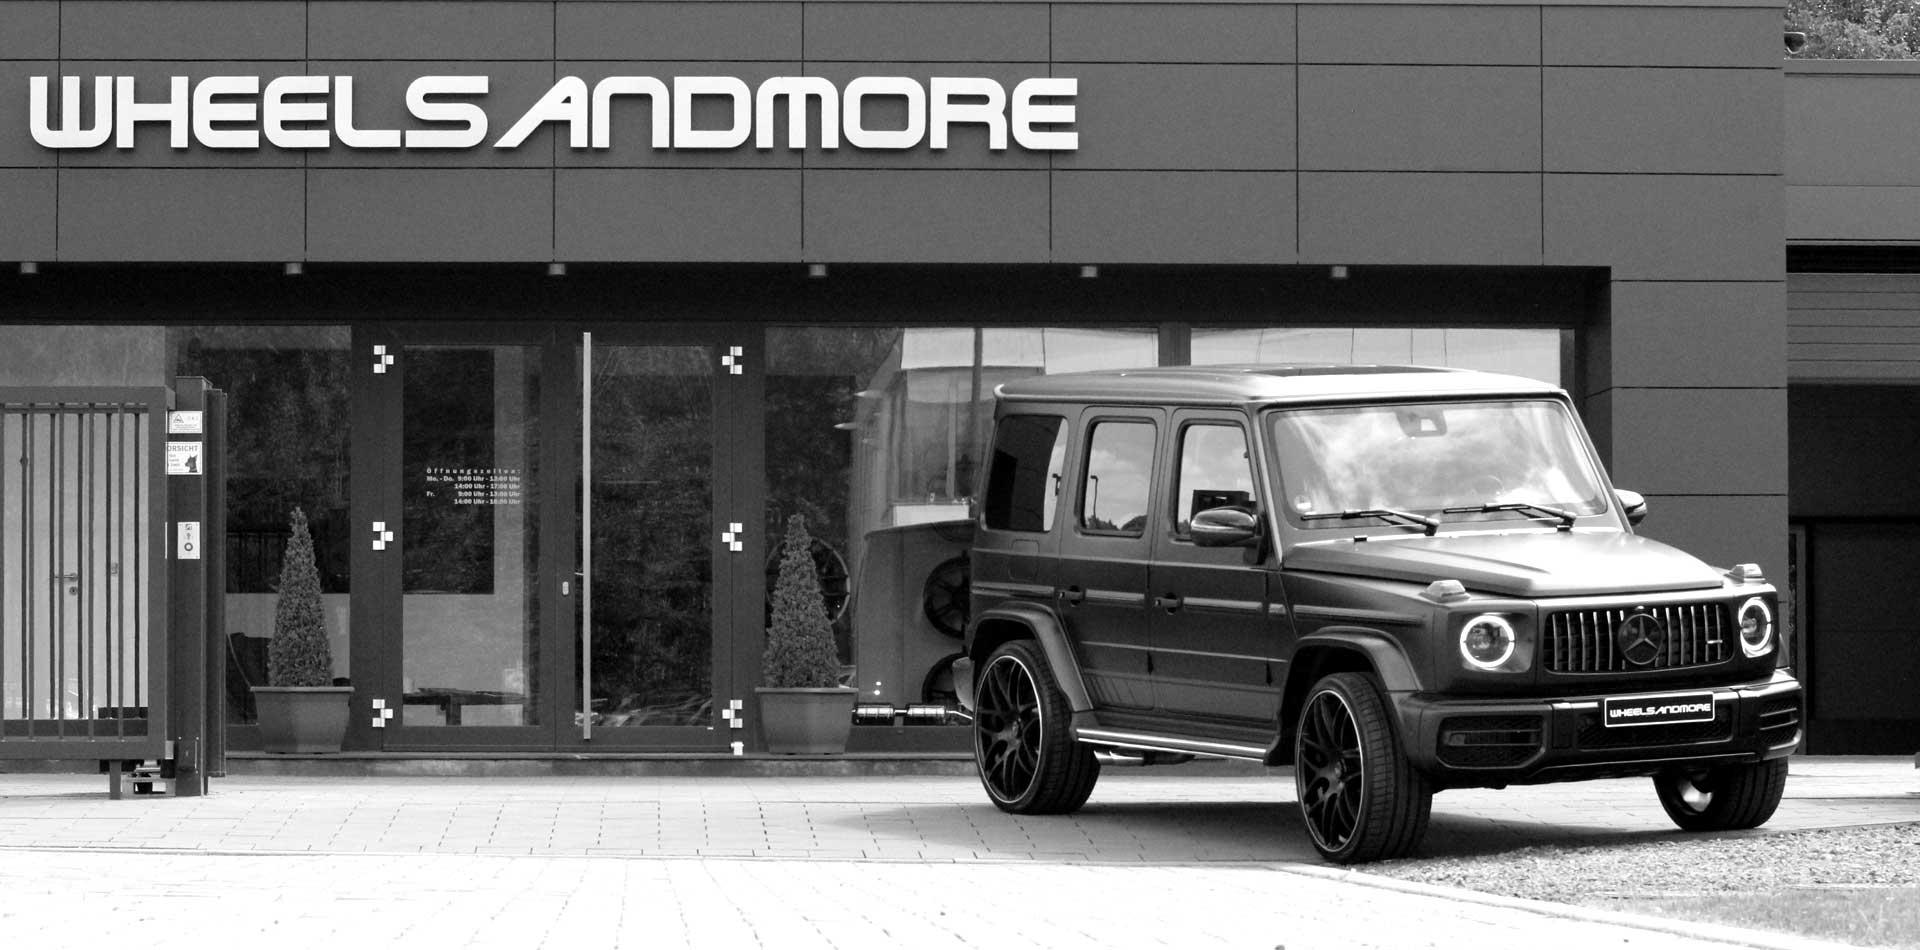 2019-mercedes-amg-g63-tuning-wheelsandmore-1.jpg